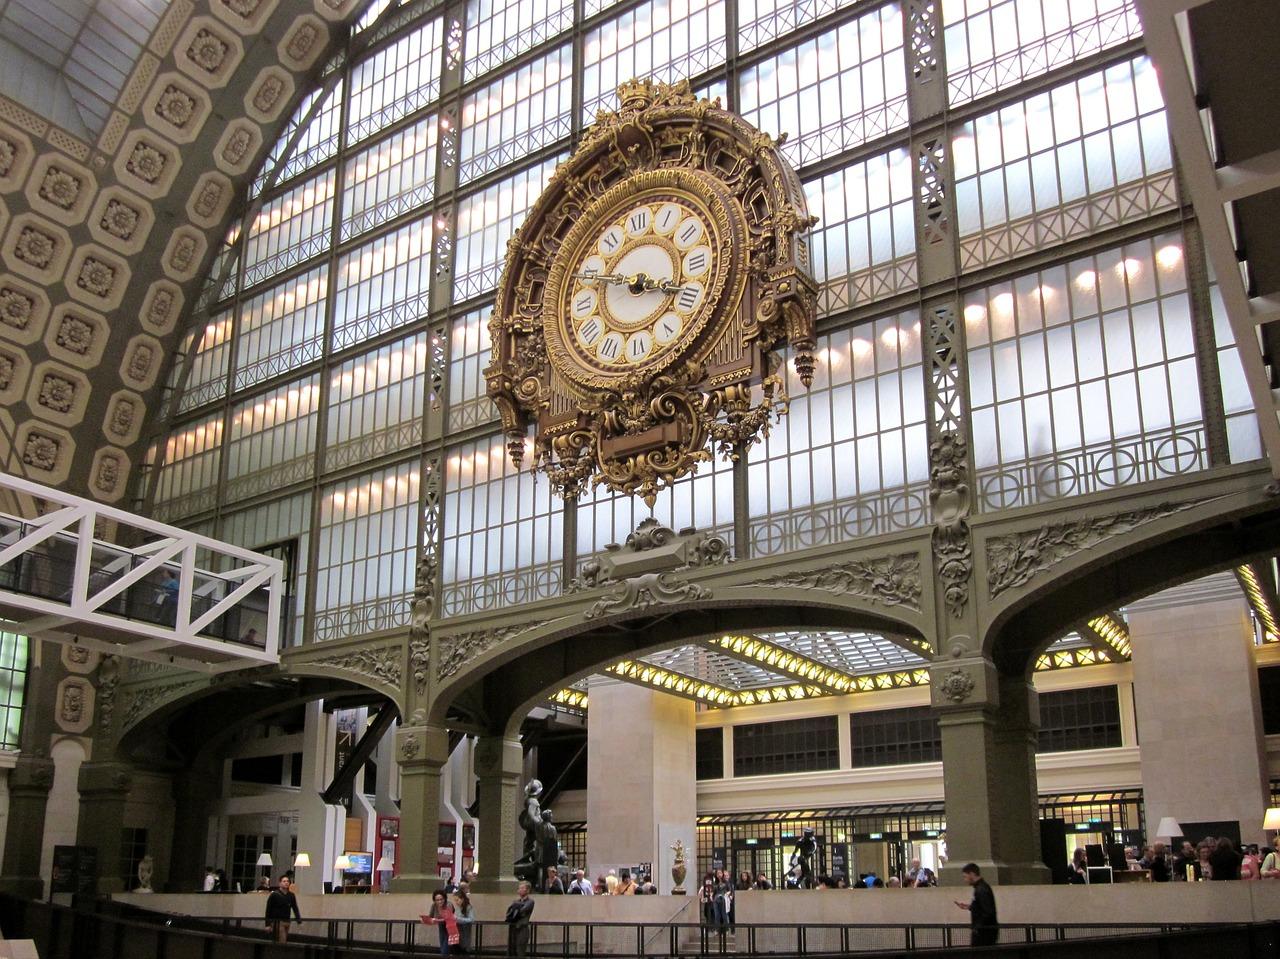 fotos de paris museu dorsay